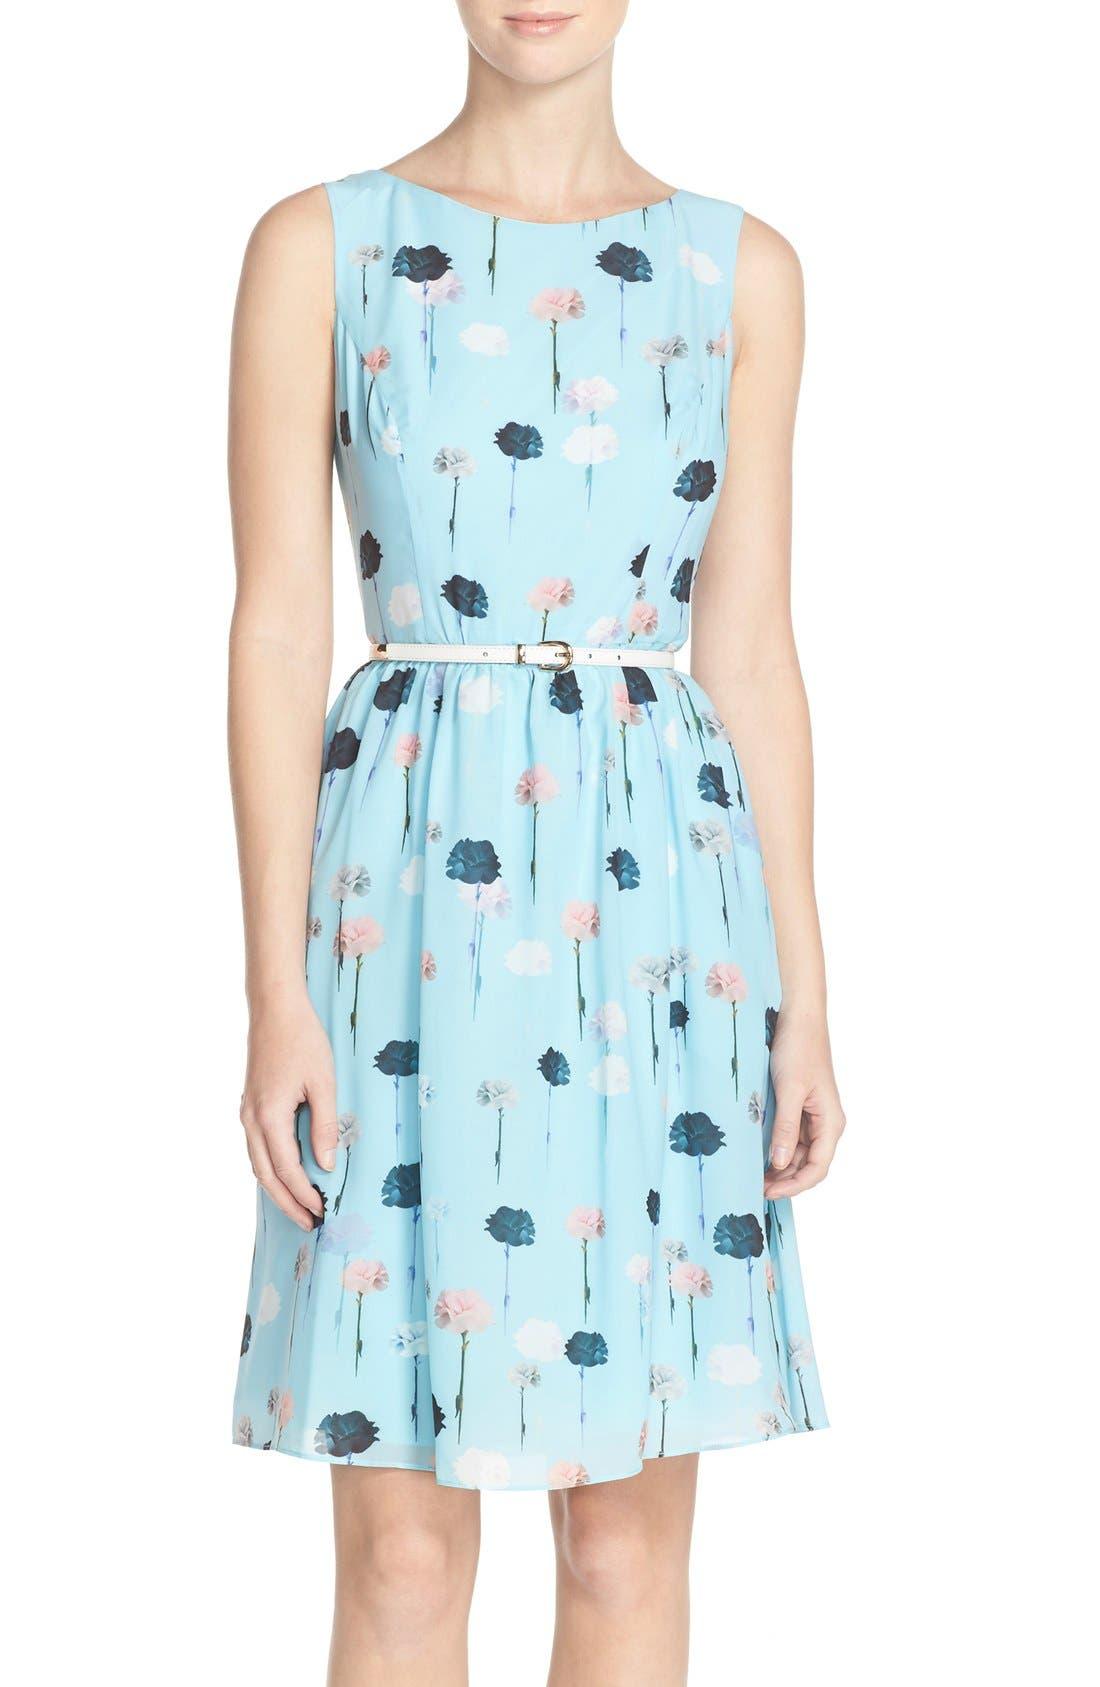 Alternate Image 1 Selected - Adrianna Papell Carnation Print Fit & Flare Dress (Regular & Petite)